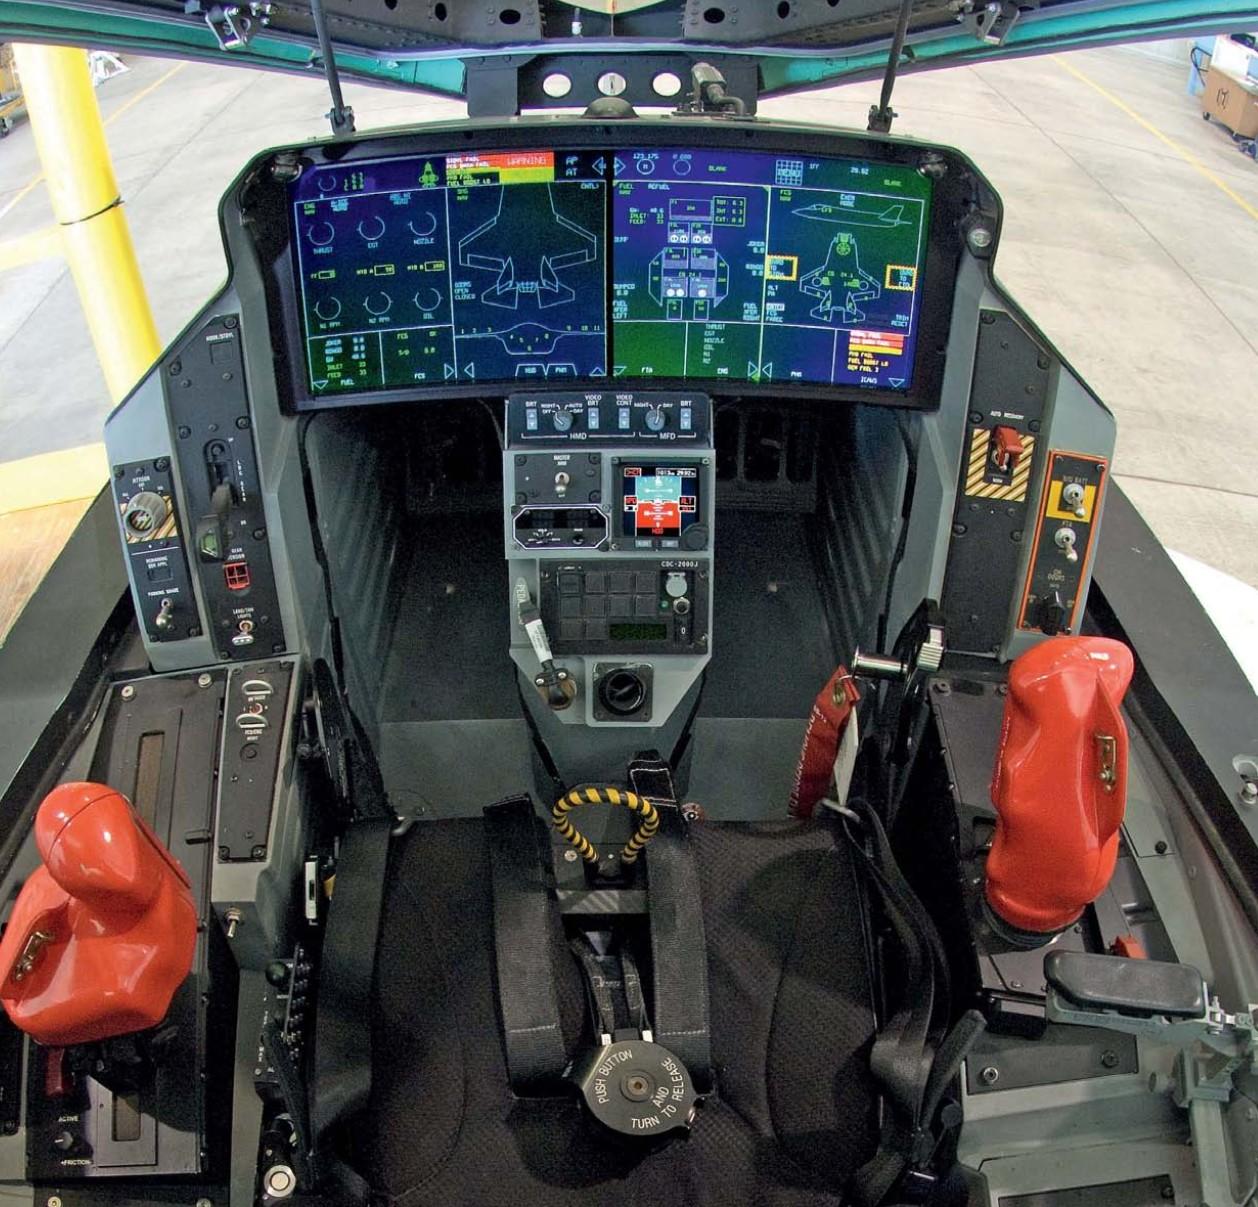 F22 Raptor Air Force Jet Cockpit Photo  Pinterest